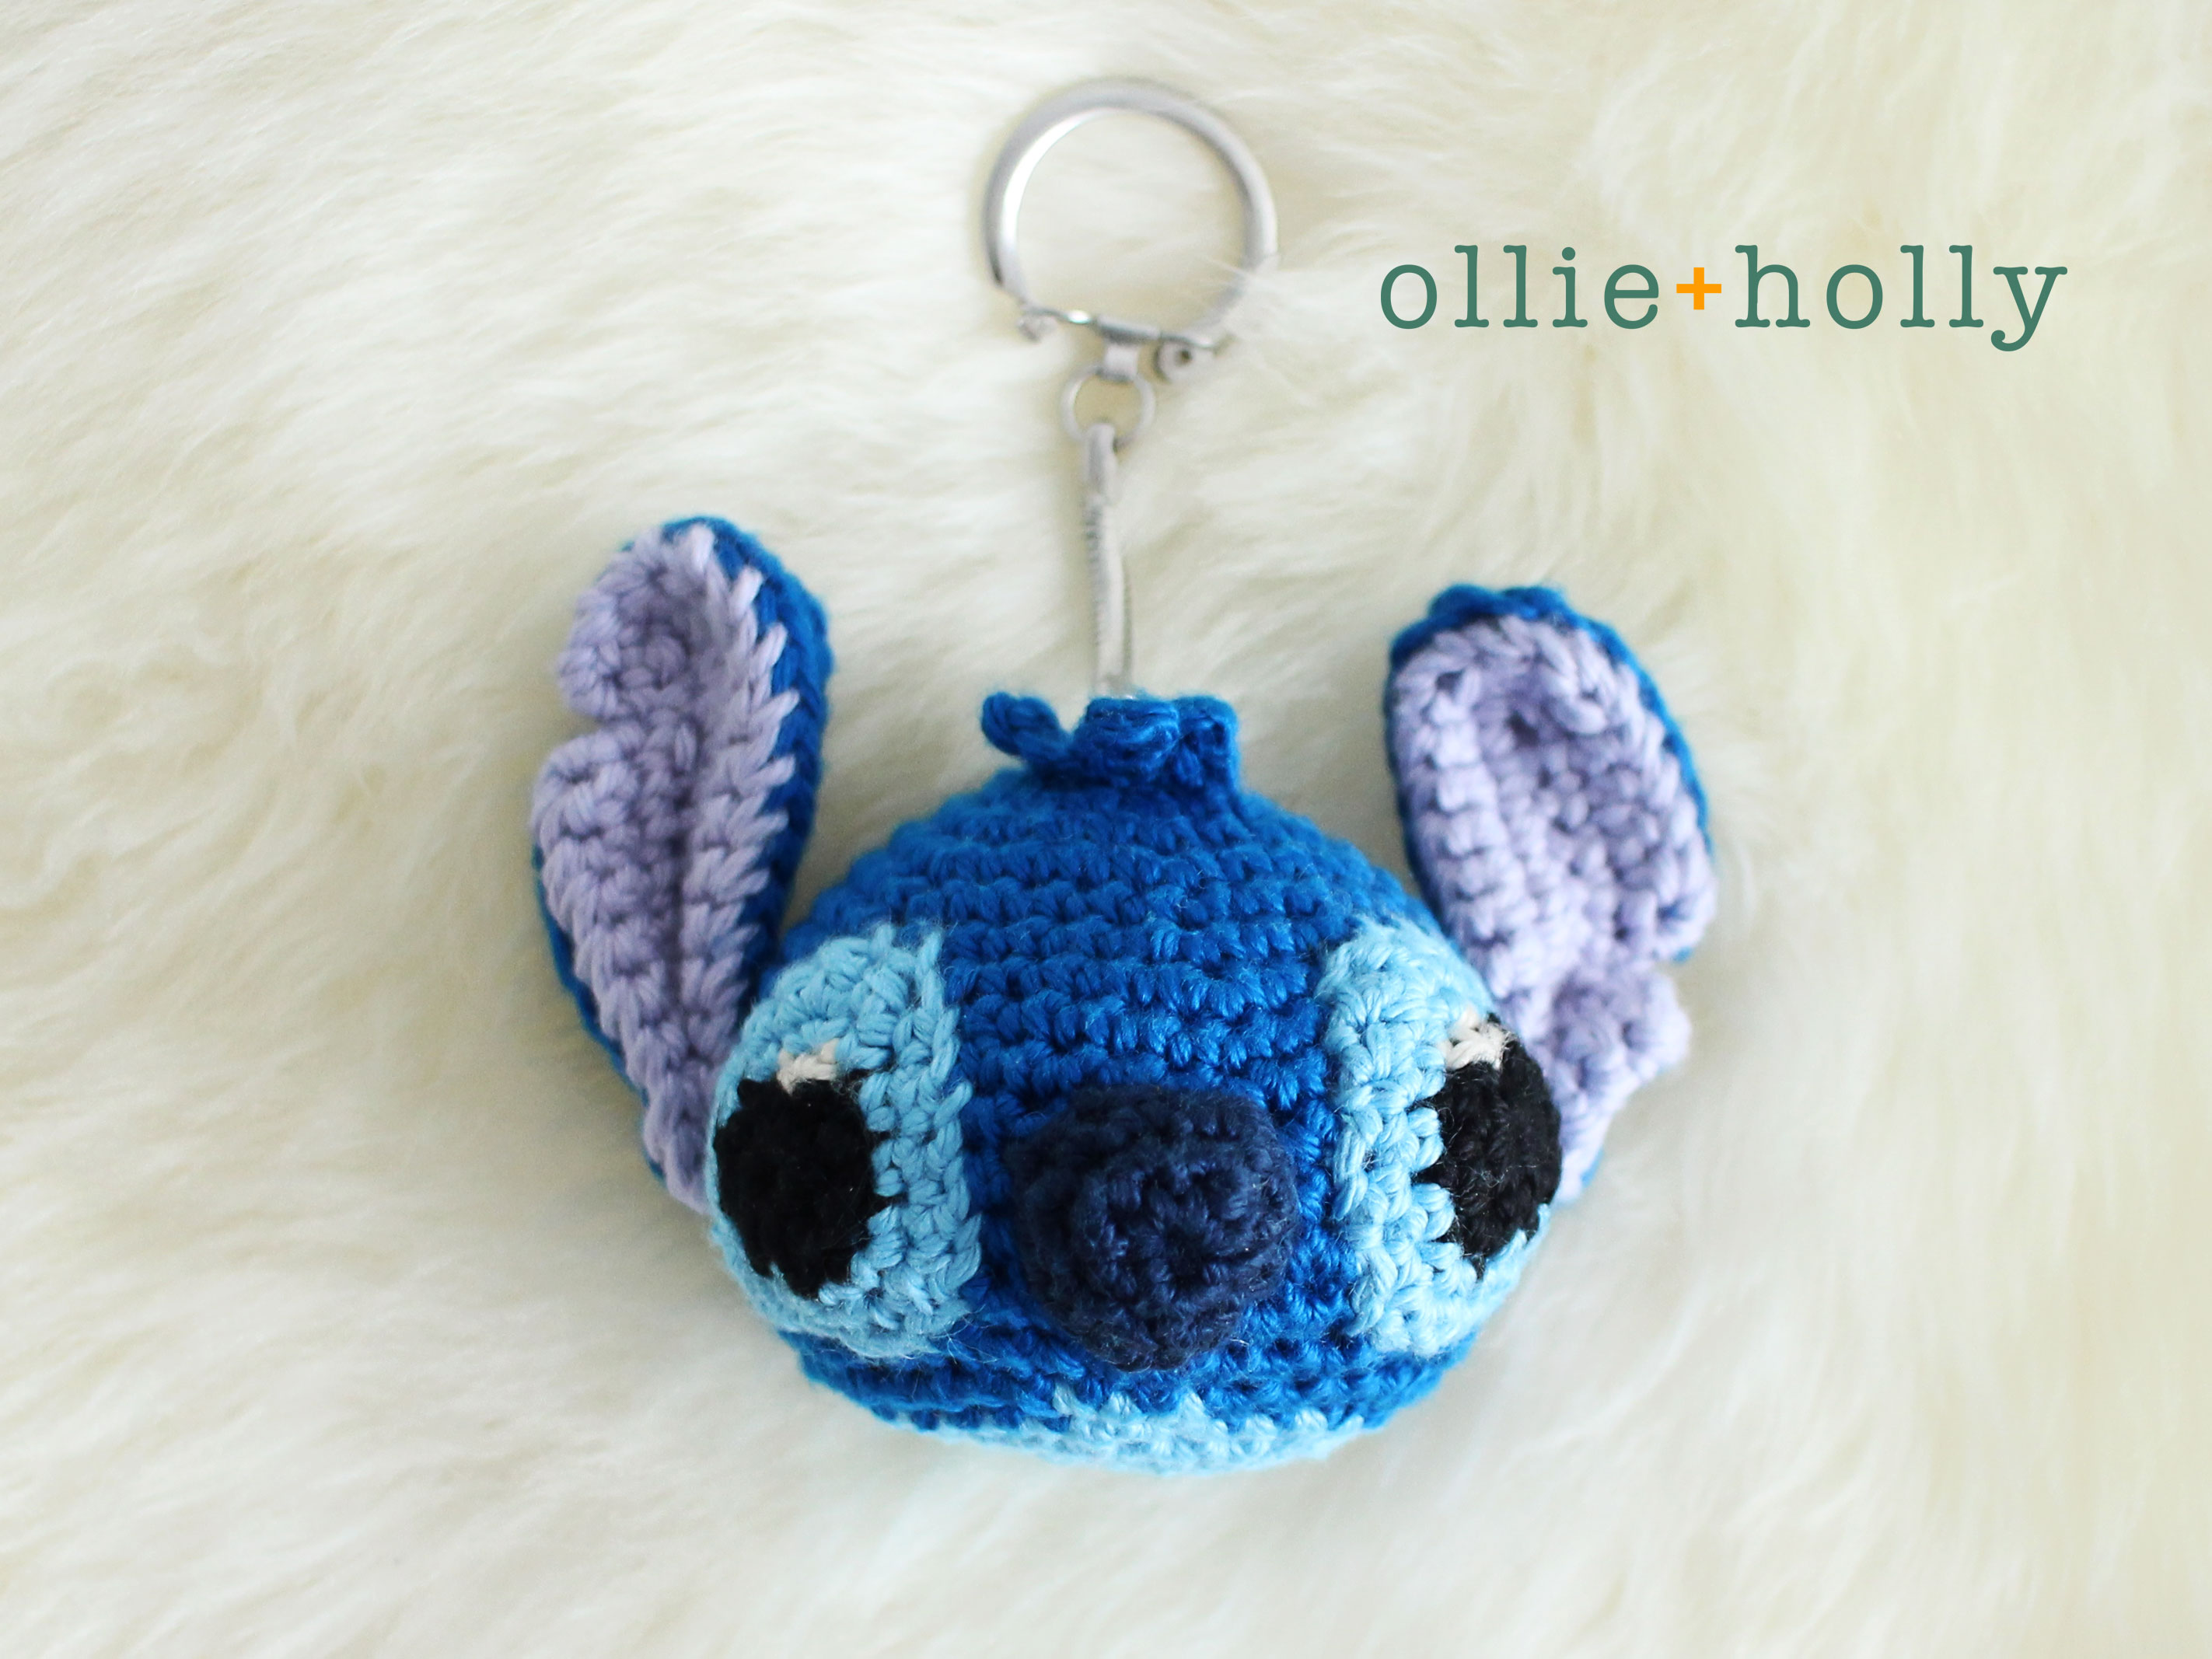 Free Disney Lilo & Stitch Amigurumi Crochet Keychain/Bag Charm Pattern Complete